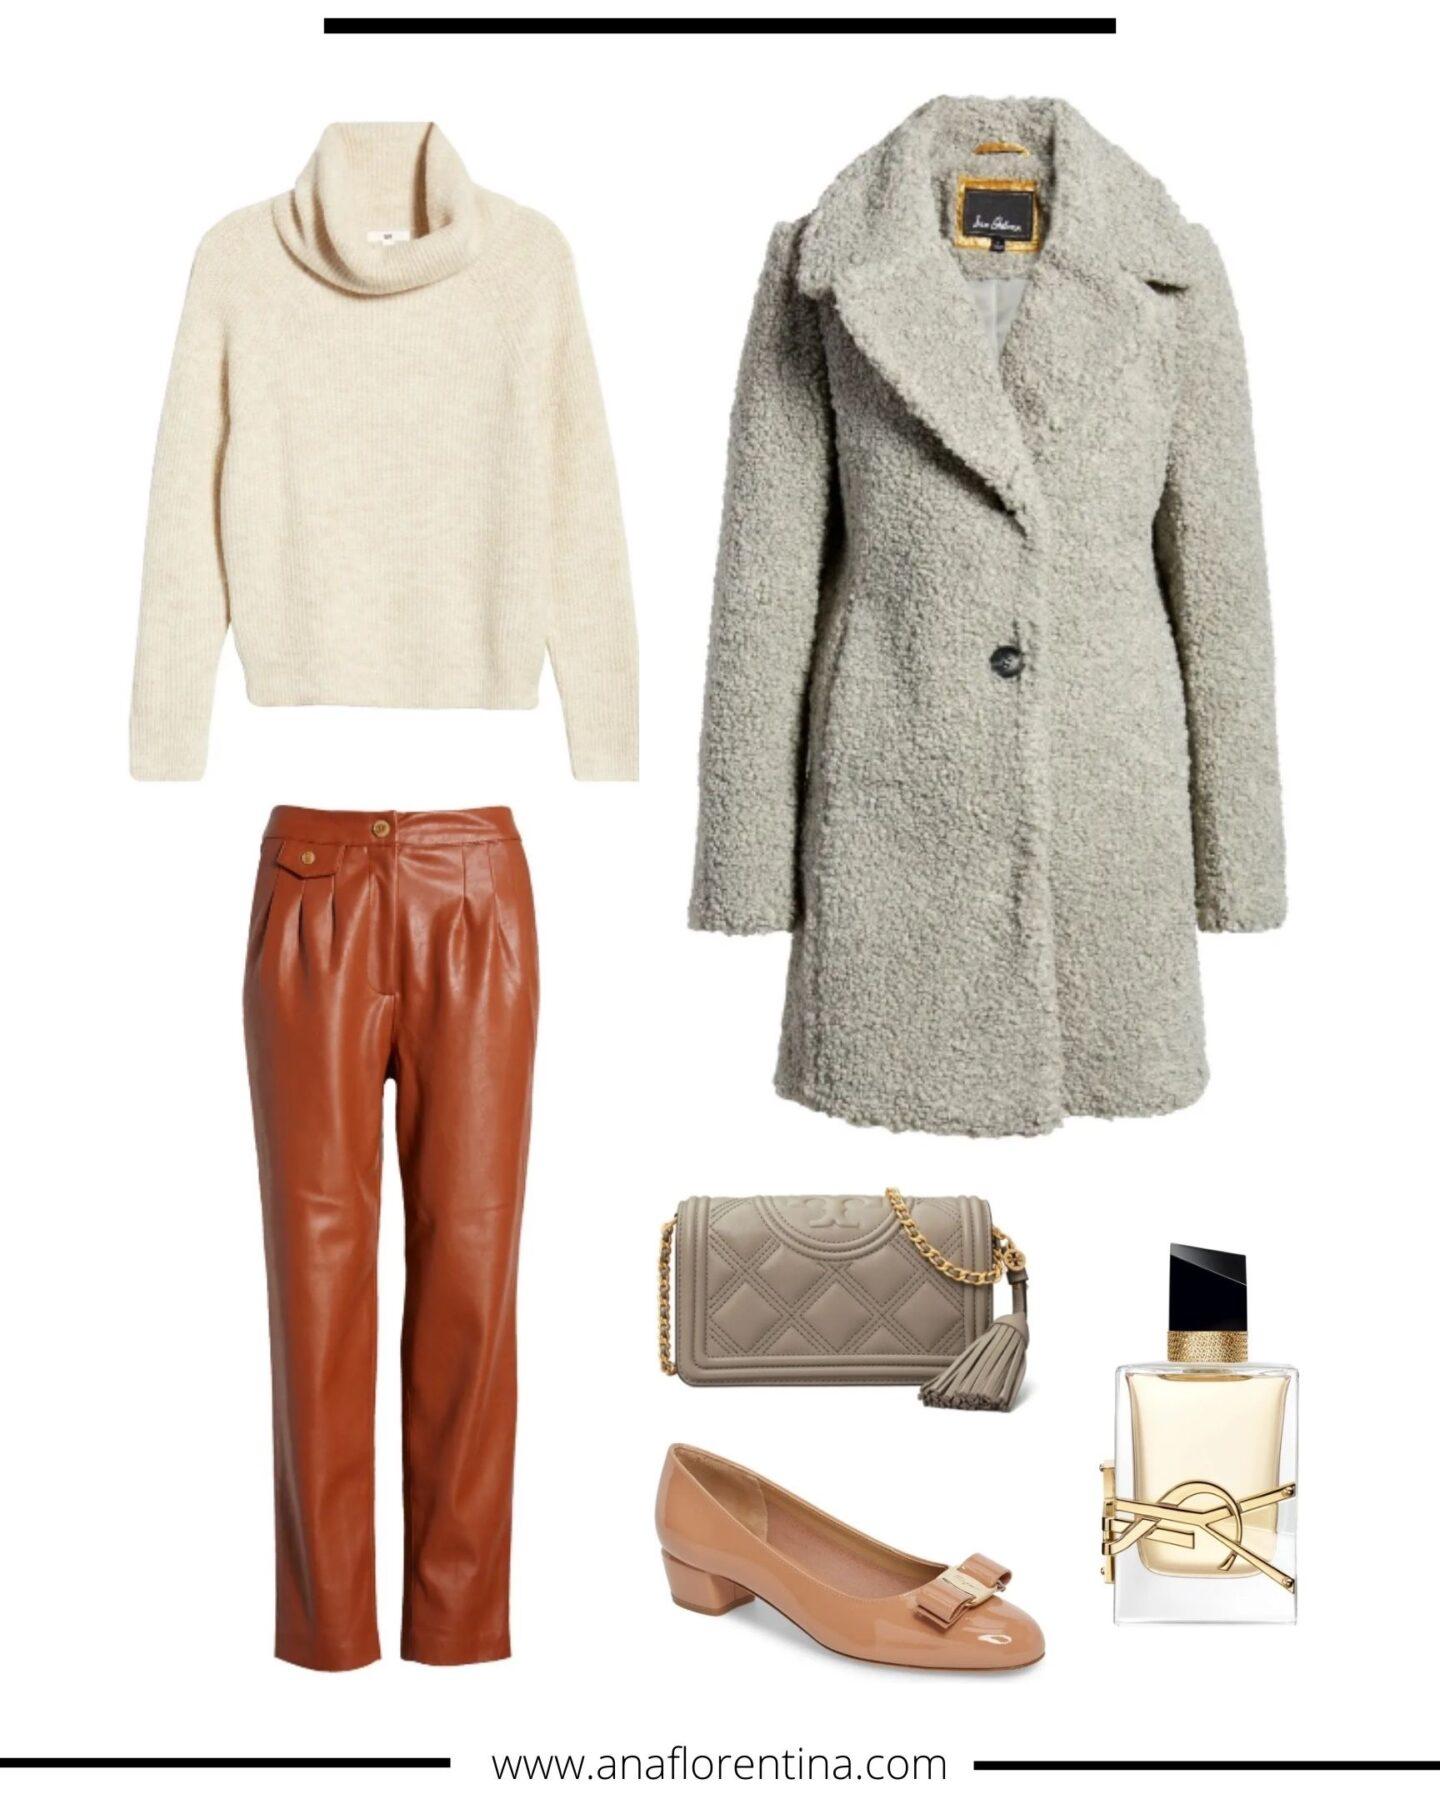 teddy-coat-outfit-idea